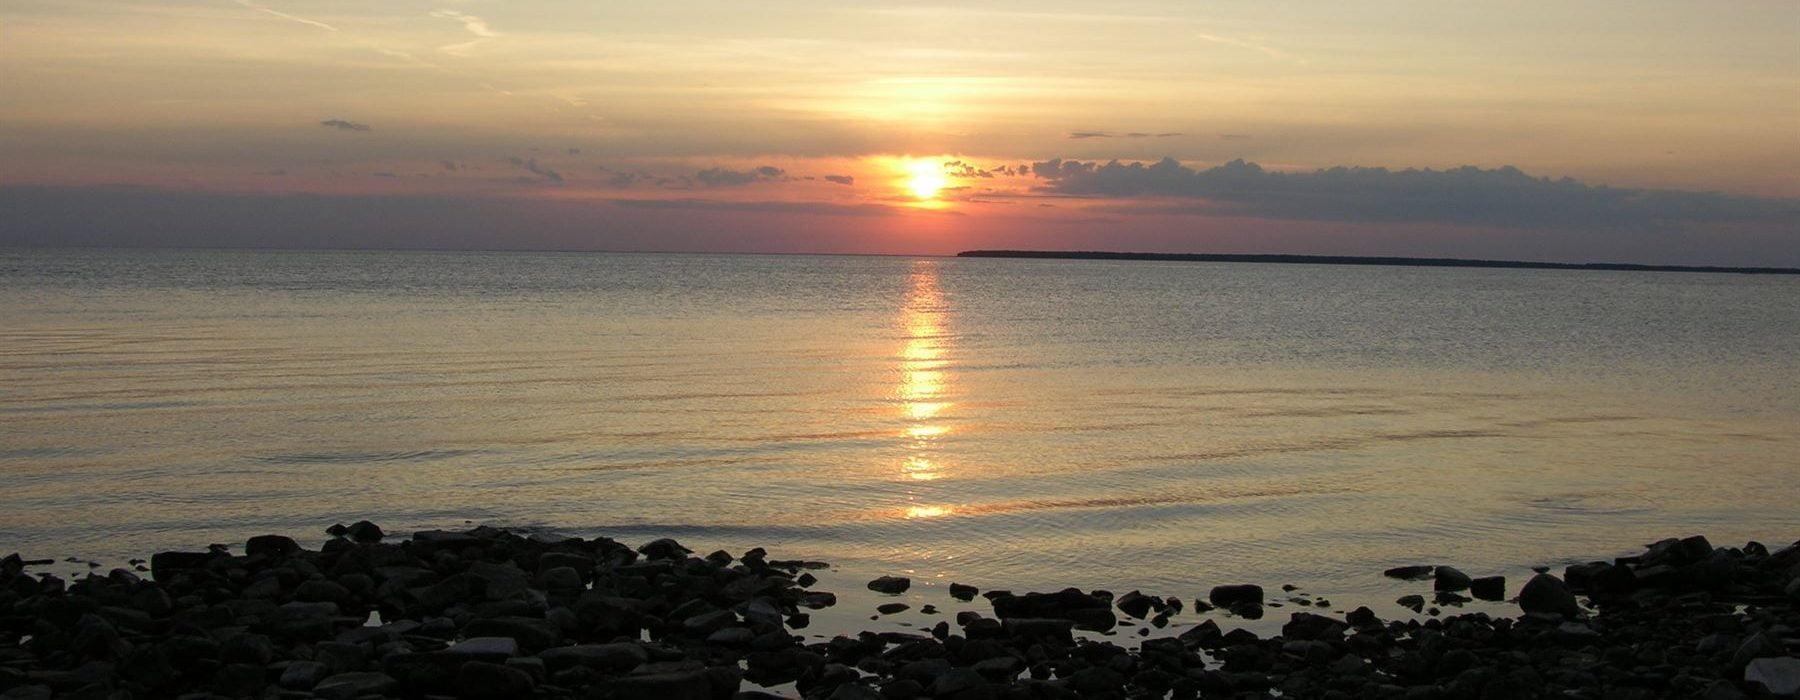 Sunset from Fish Creek Beach